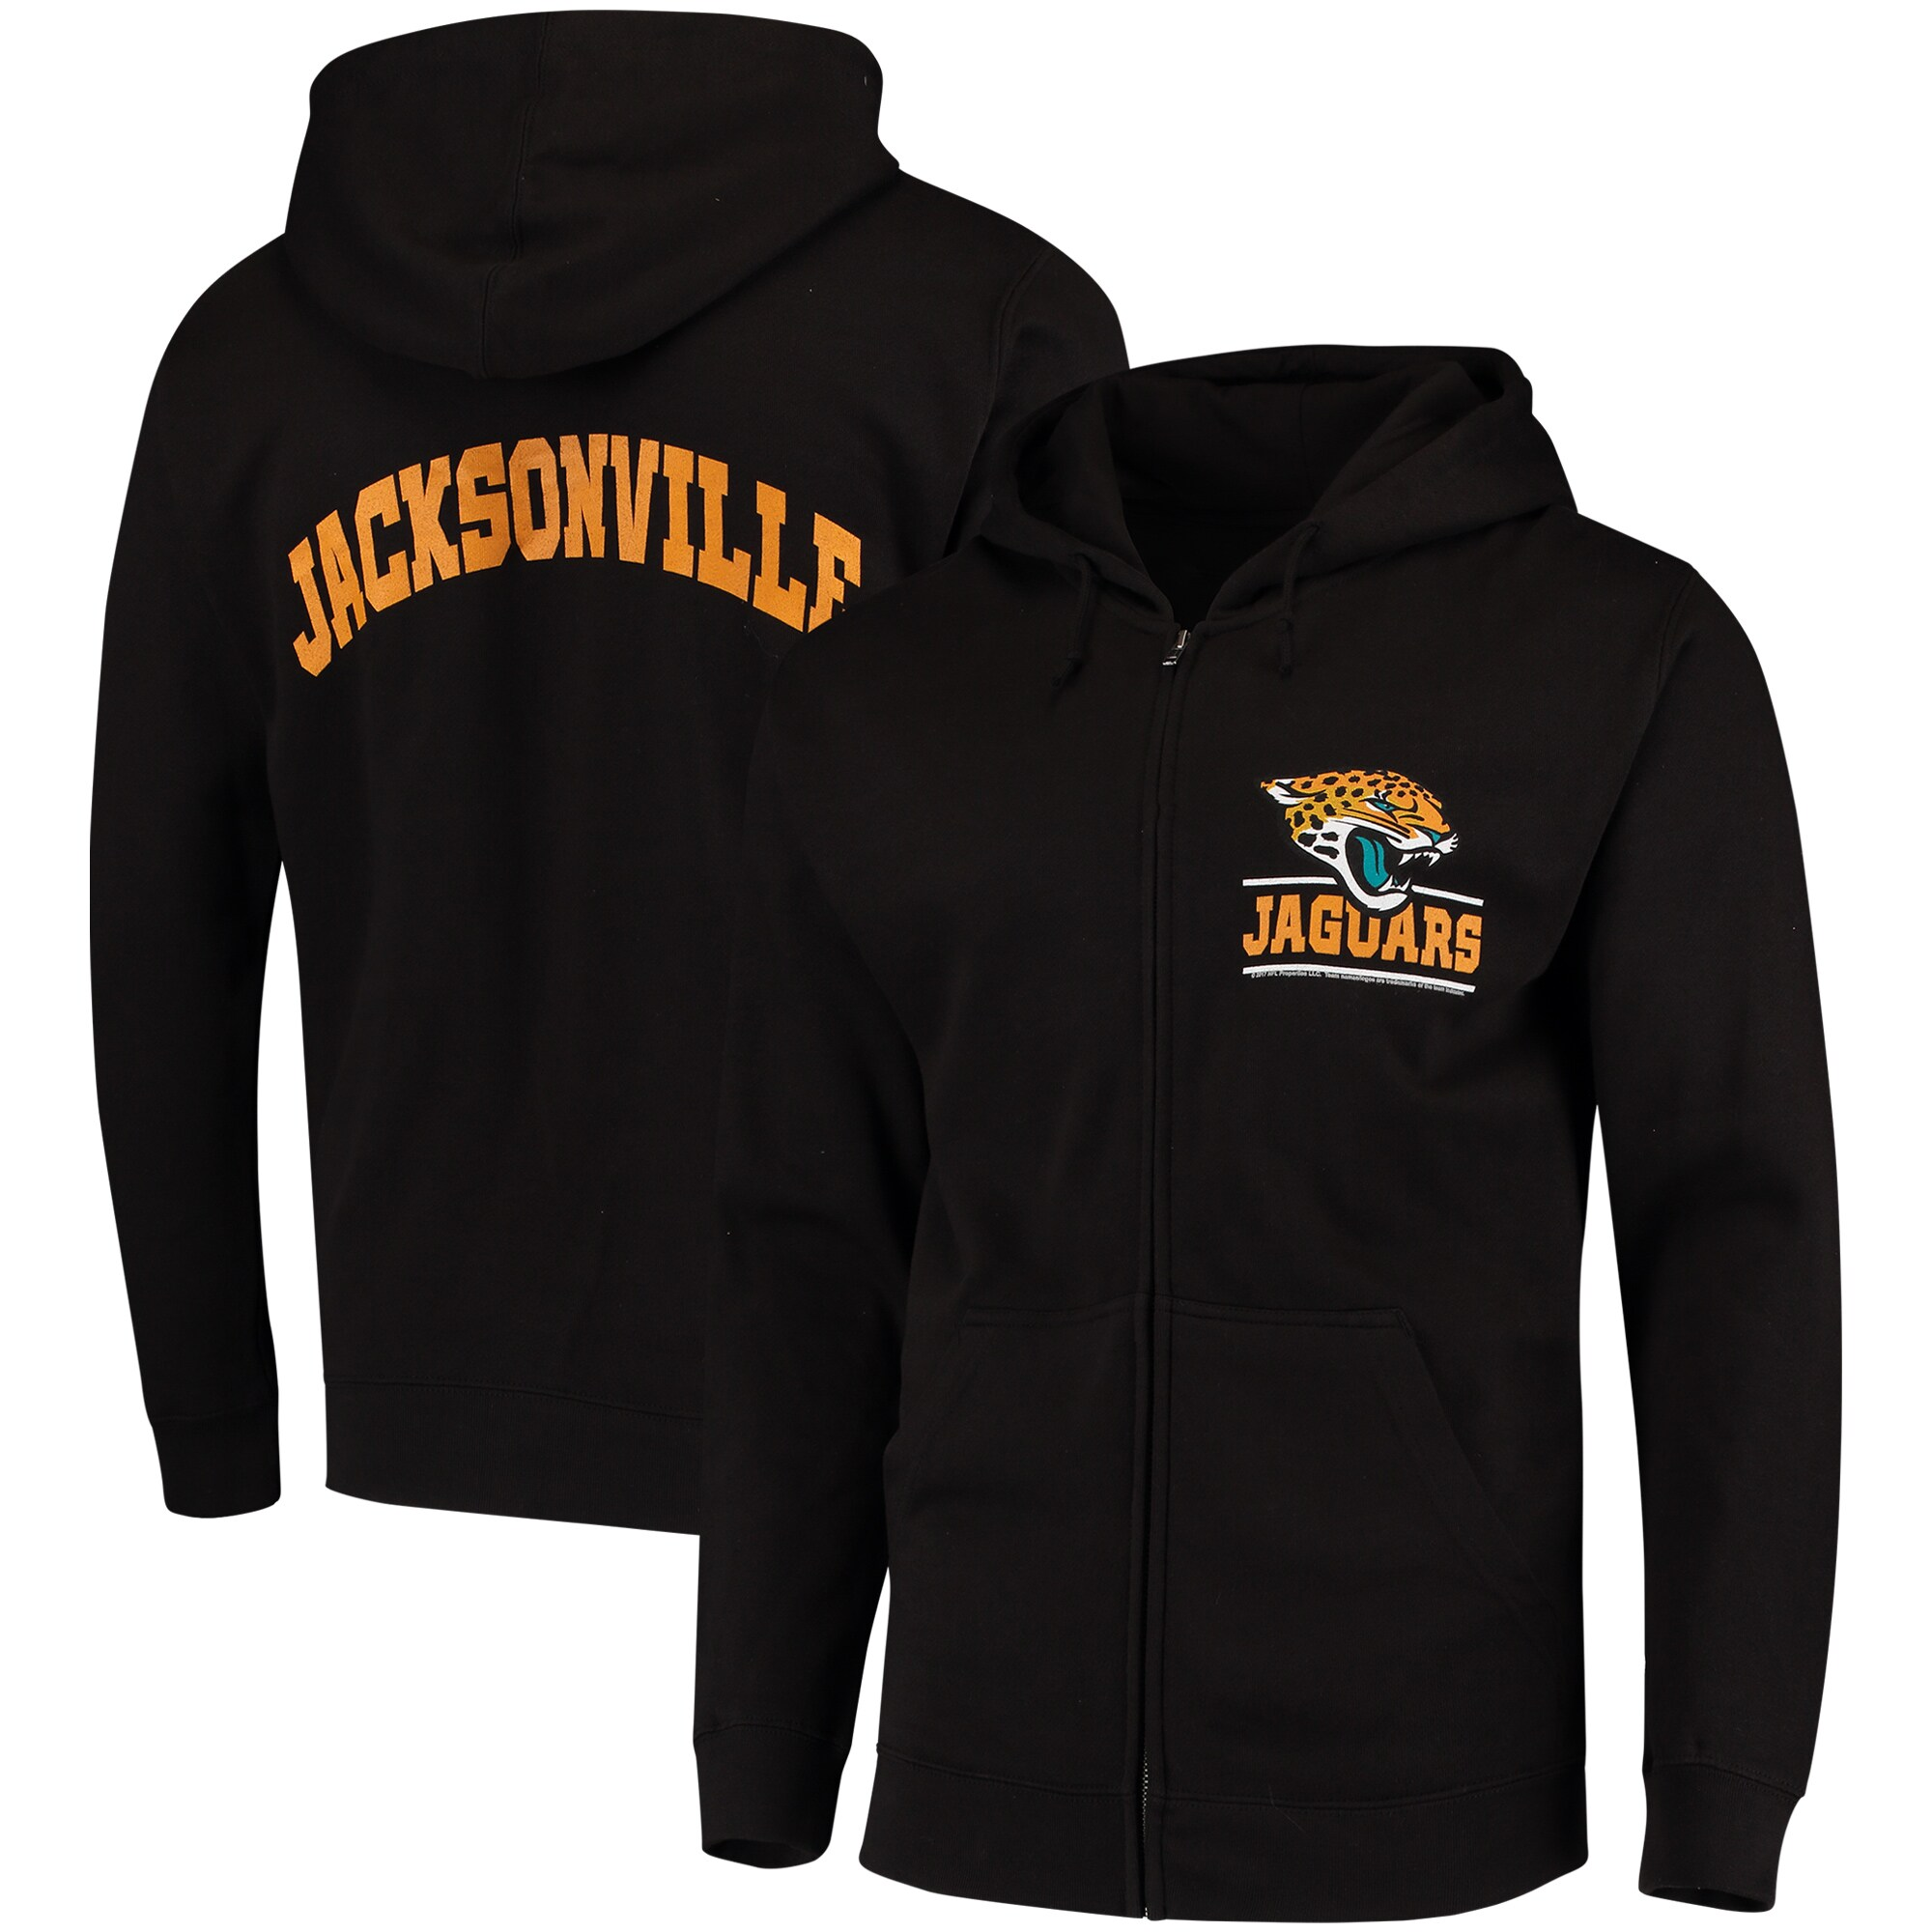 Jacksonville Jaguars Quarterback Full-Zip Hoodie - Black